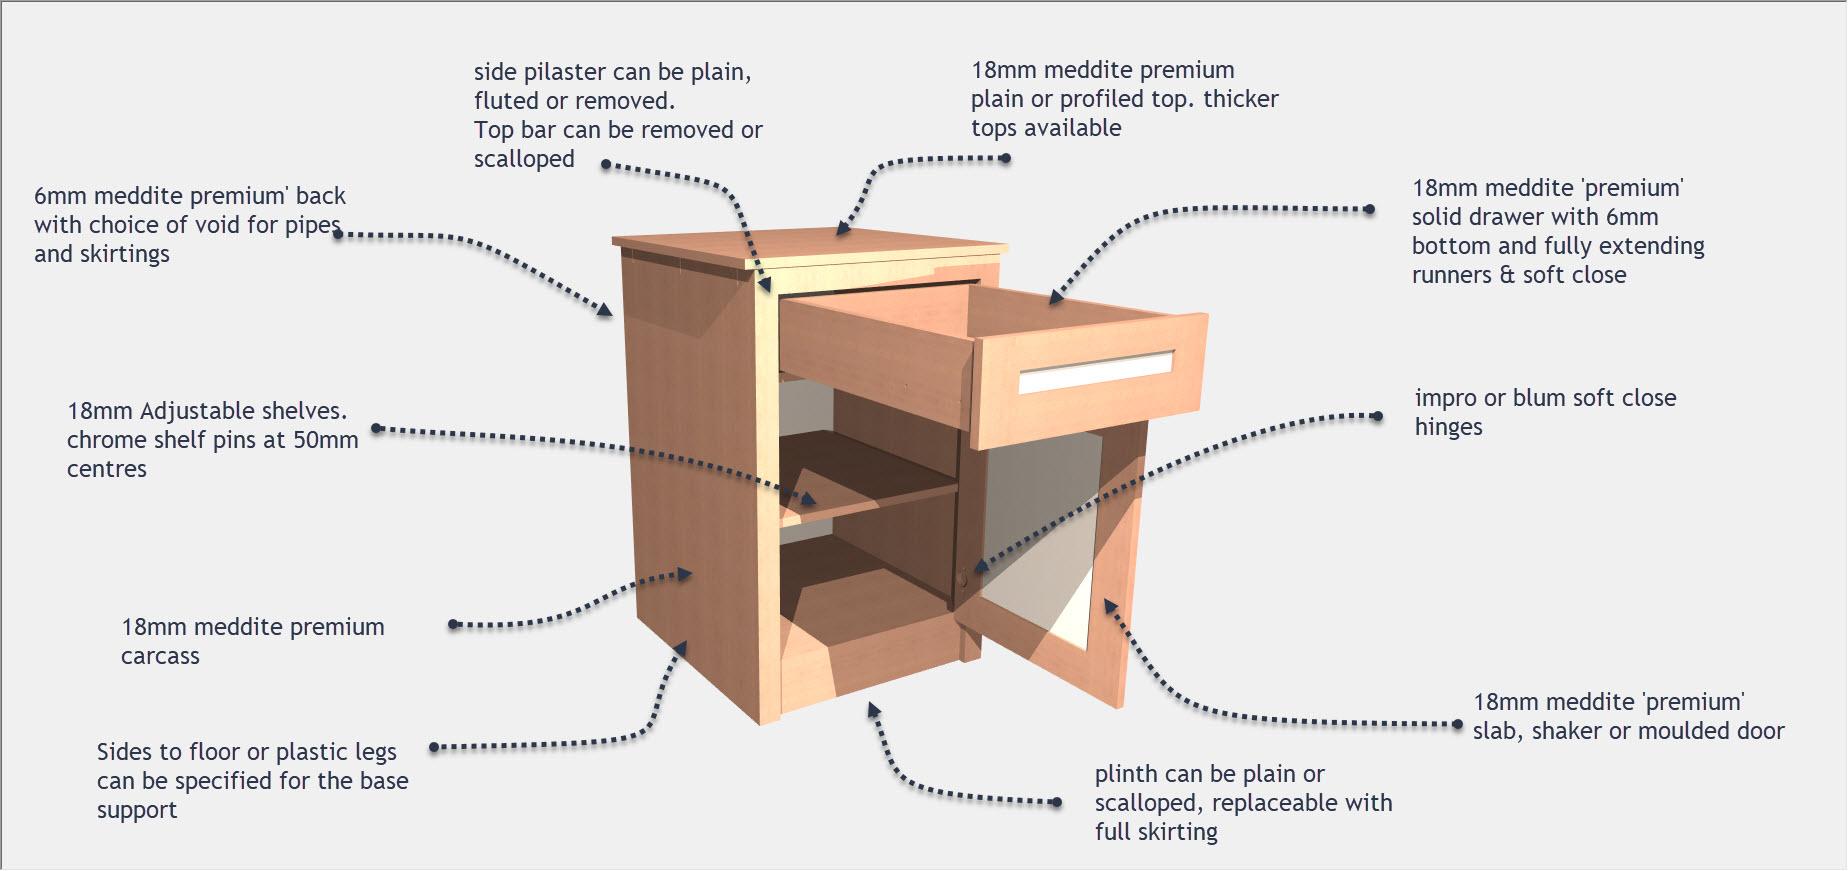 Mdf Construction Details The Cabinet Shop